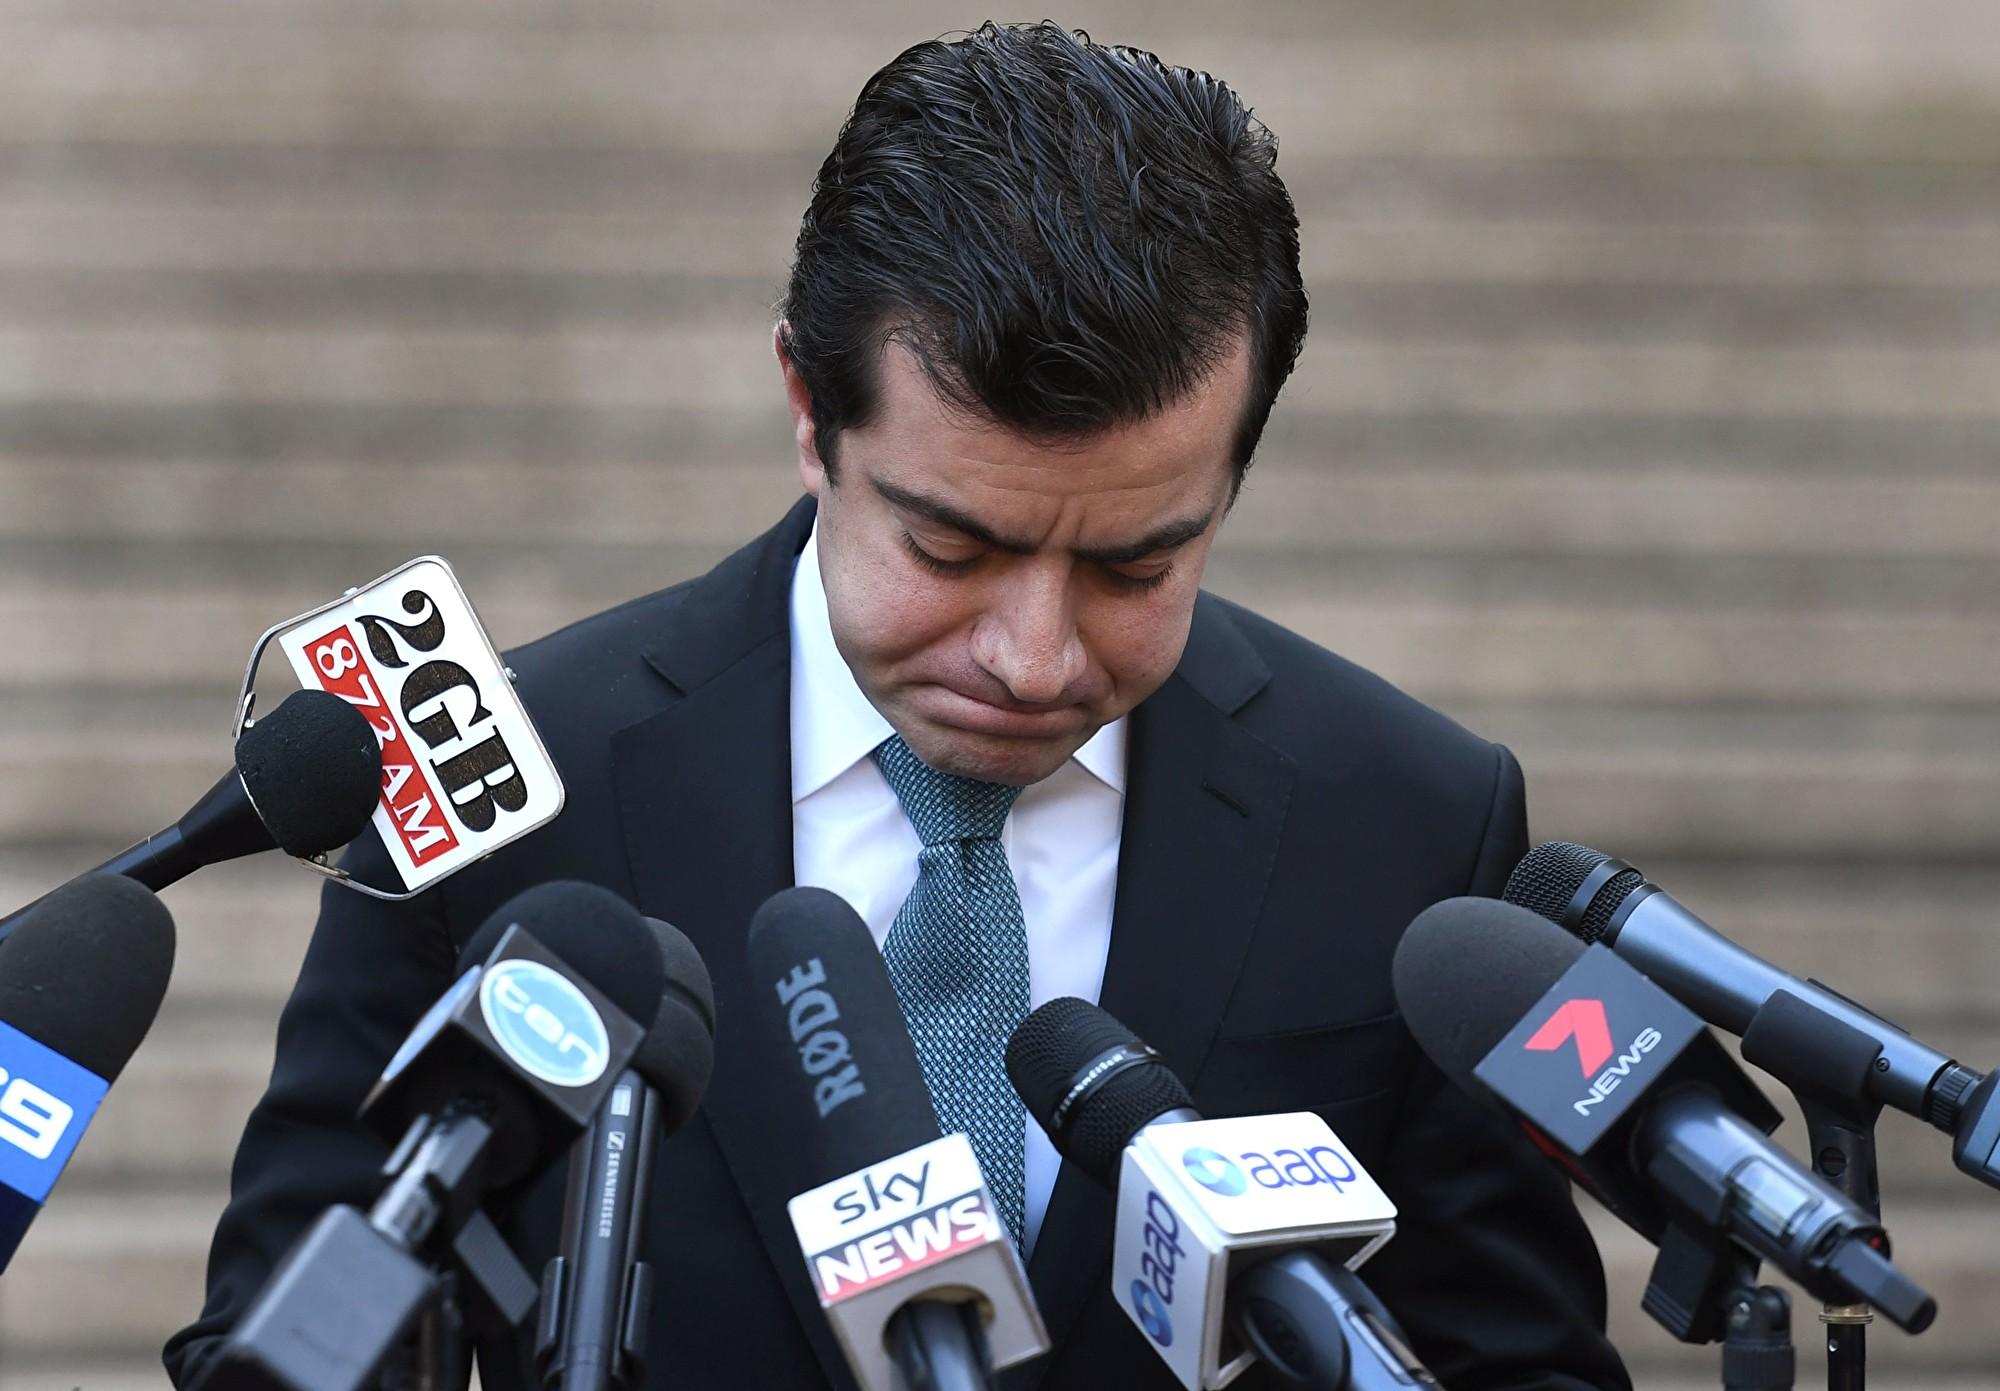 2017年12月12日,澳洲工黨參議員鄧森(Sam Dastyari)宣佈退出議會和辭去參議員的職務。(WILLIAM WEST/AFP/Getty Images)